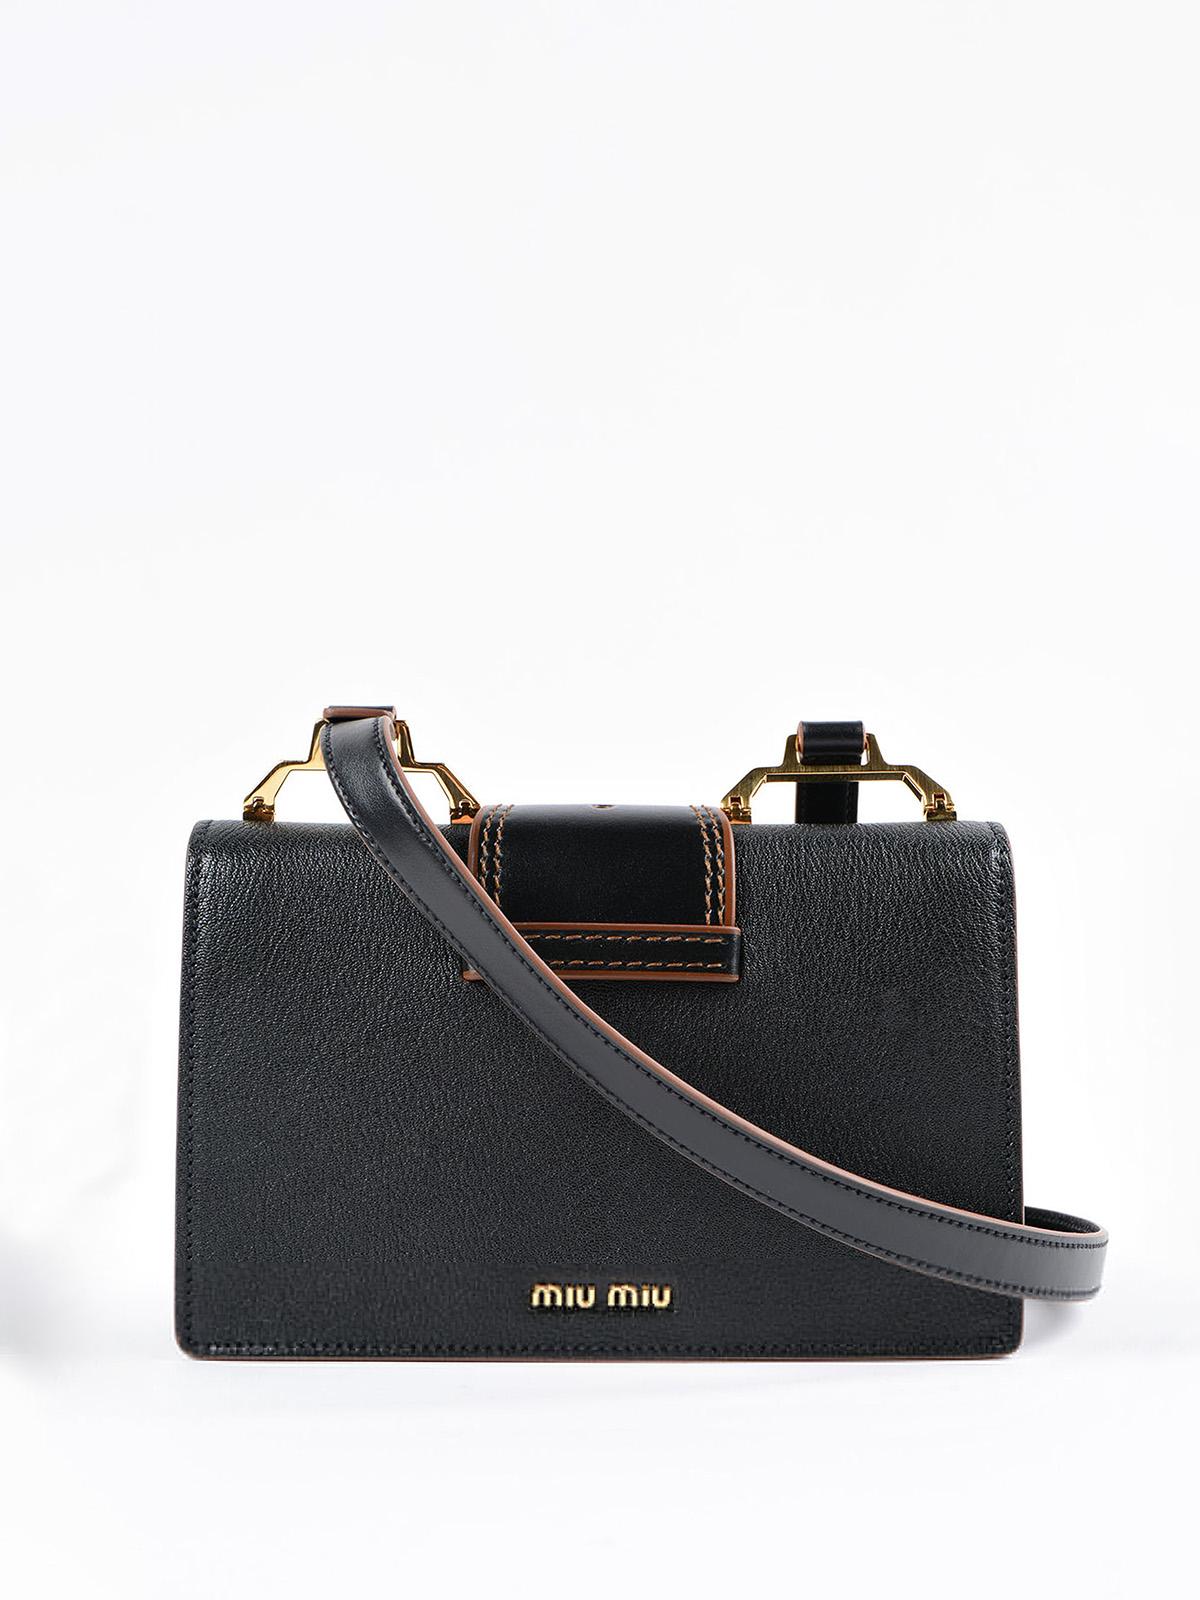 4a5a361026d3 iKRIX MIU MIU  cross body bags - Miu Lady Bag jewel cross body bag